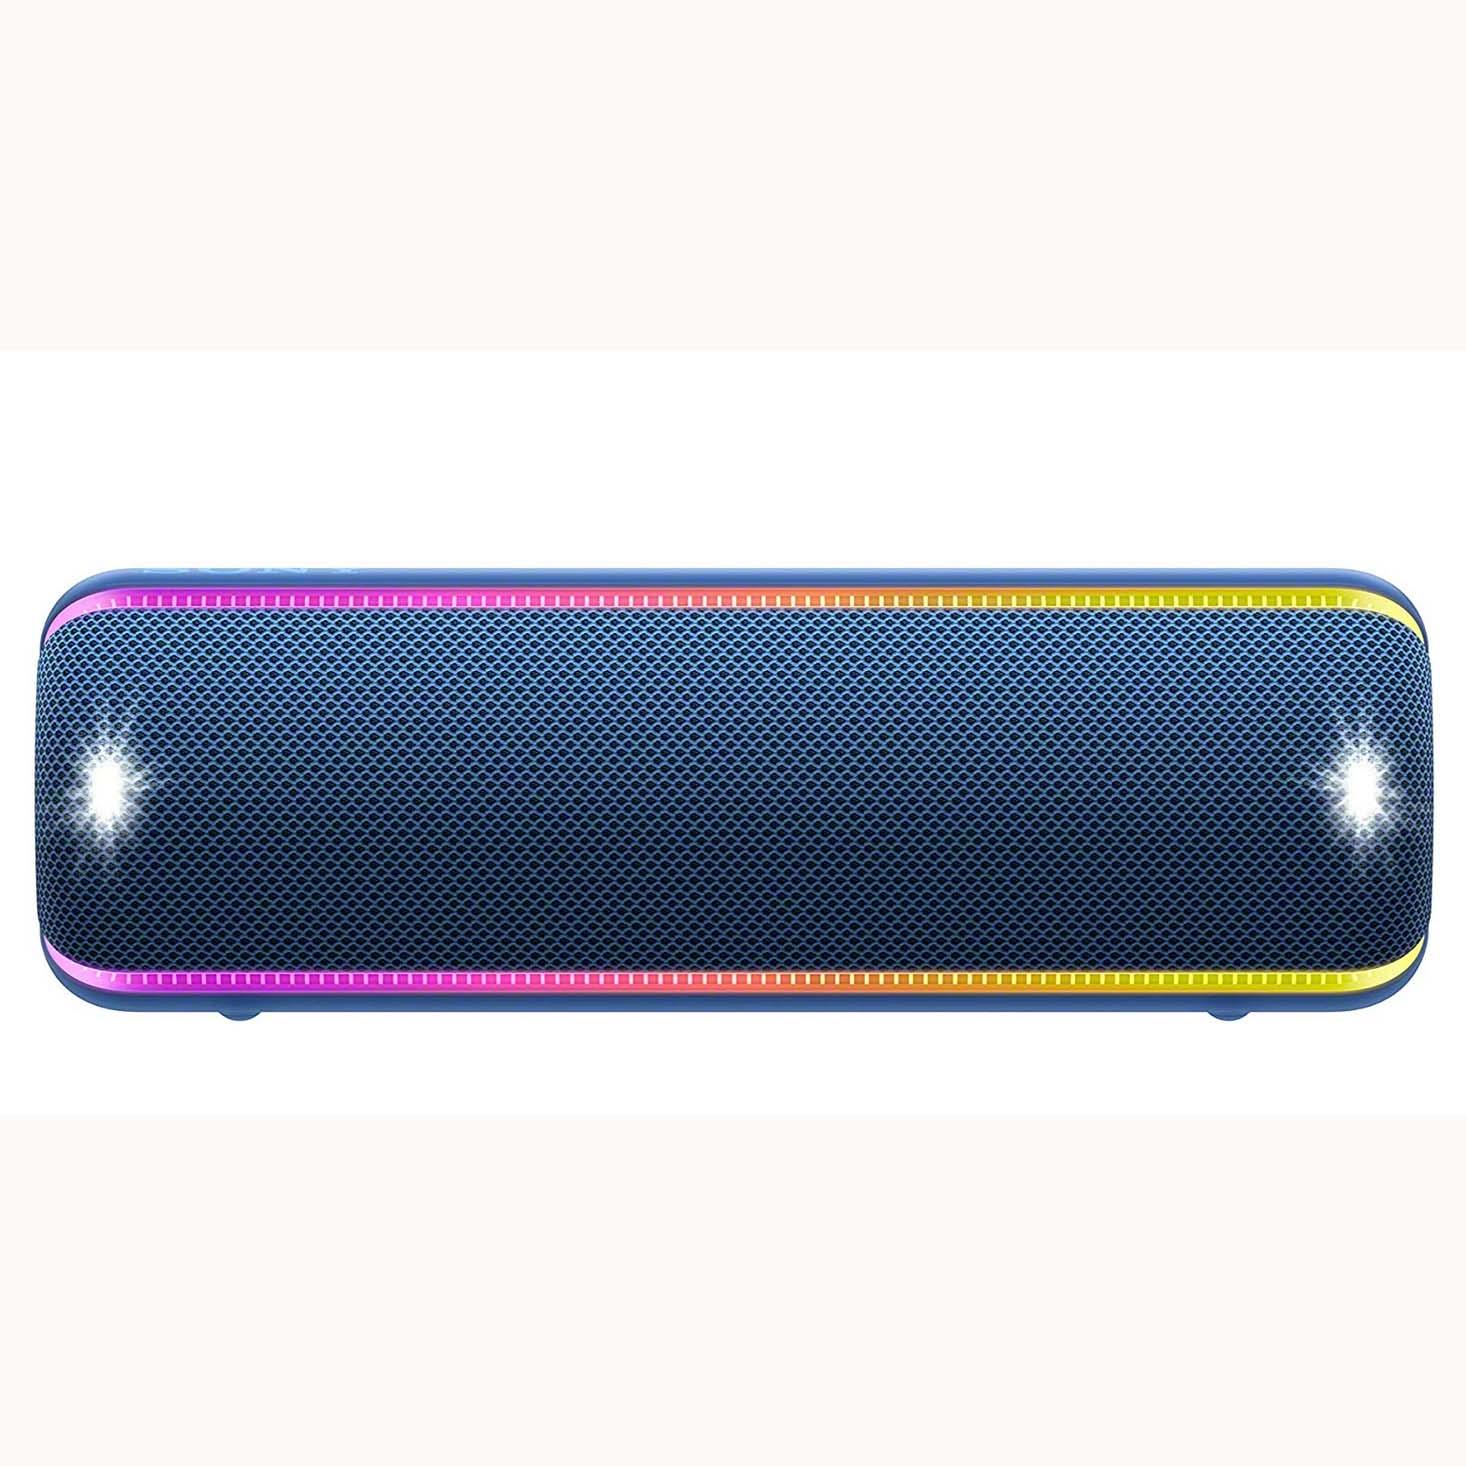 Sony SRS-XB32 Extra Bass Portable Bluetooth Speaker, Blue (SRSXB32/L) $69.16